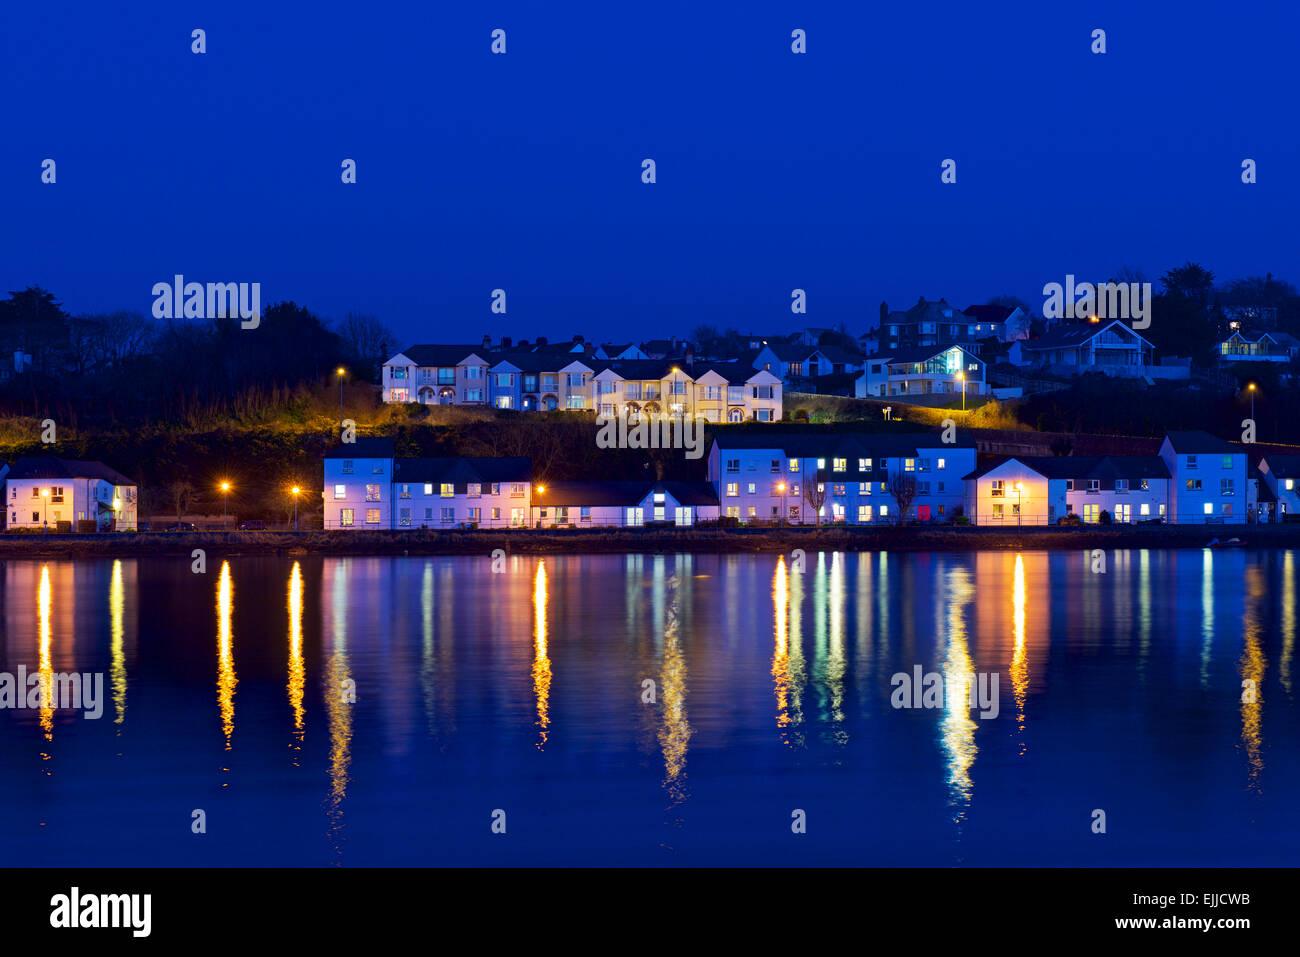 West End, Bideford, Devon, at night, and estuary of River Torridge, England UK - Stock Image